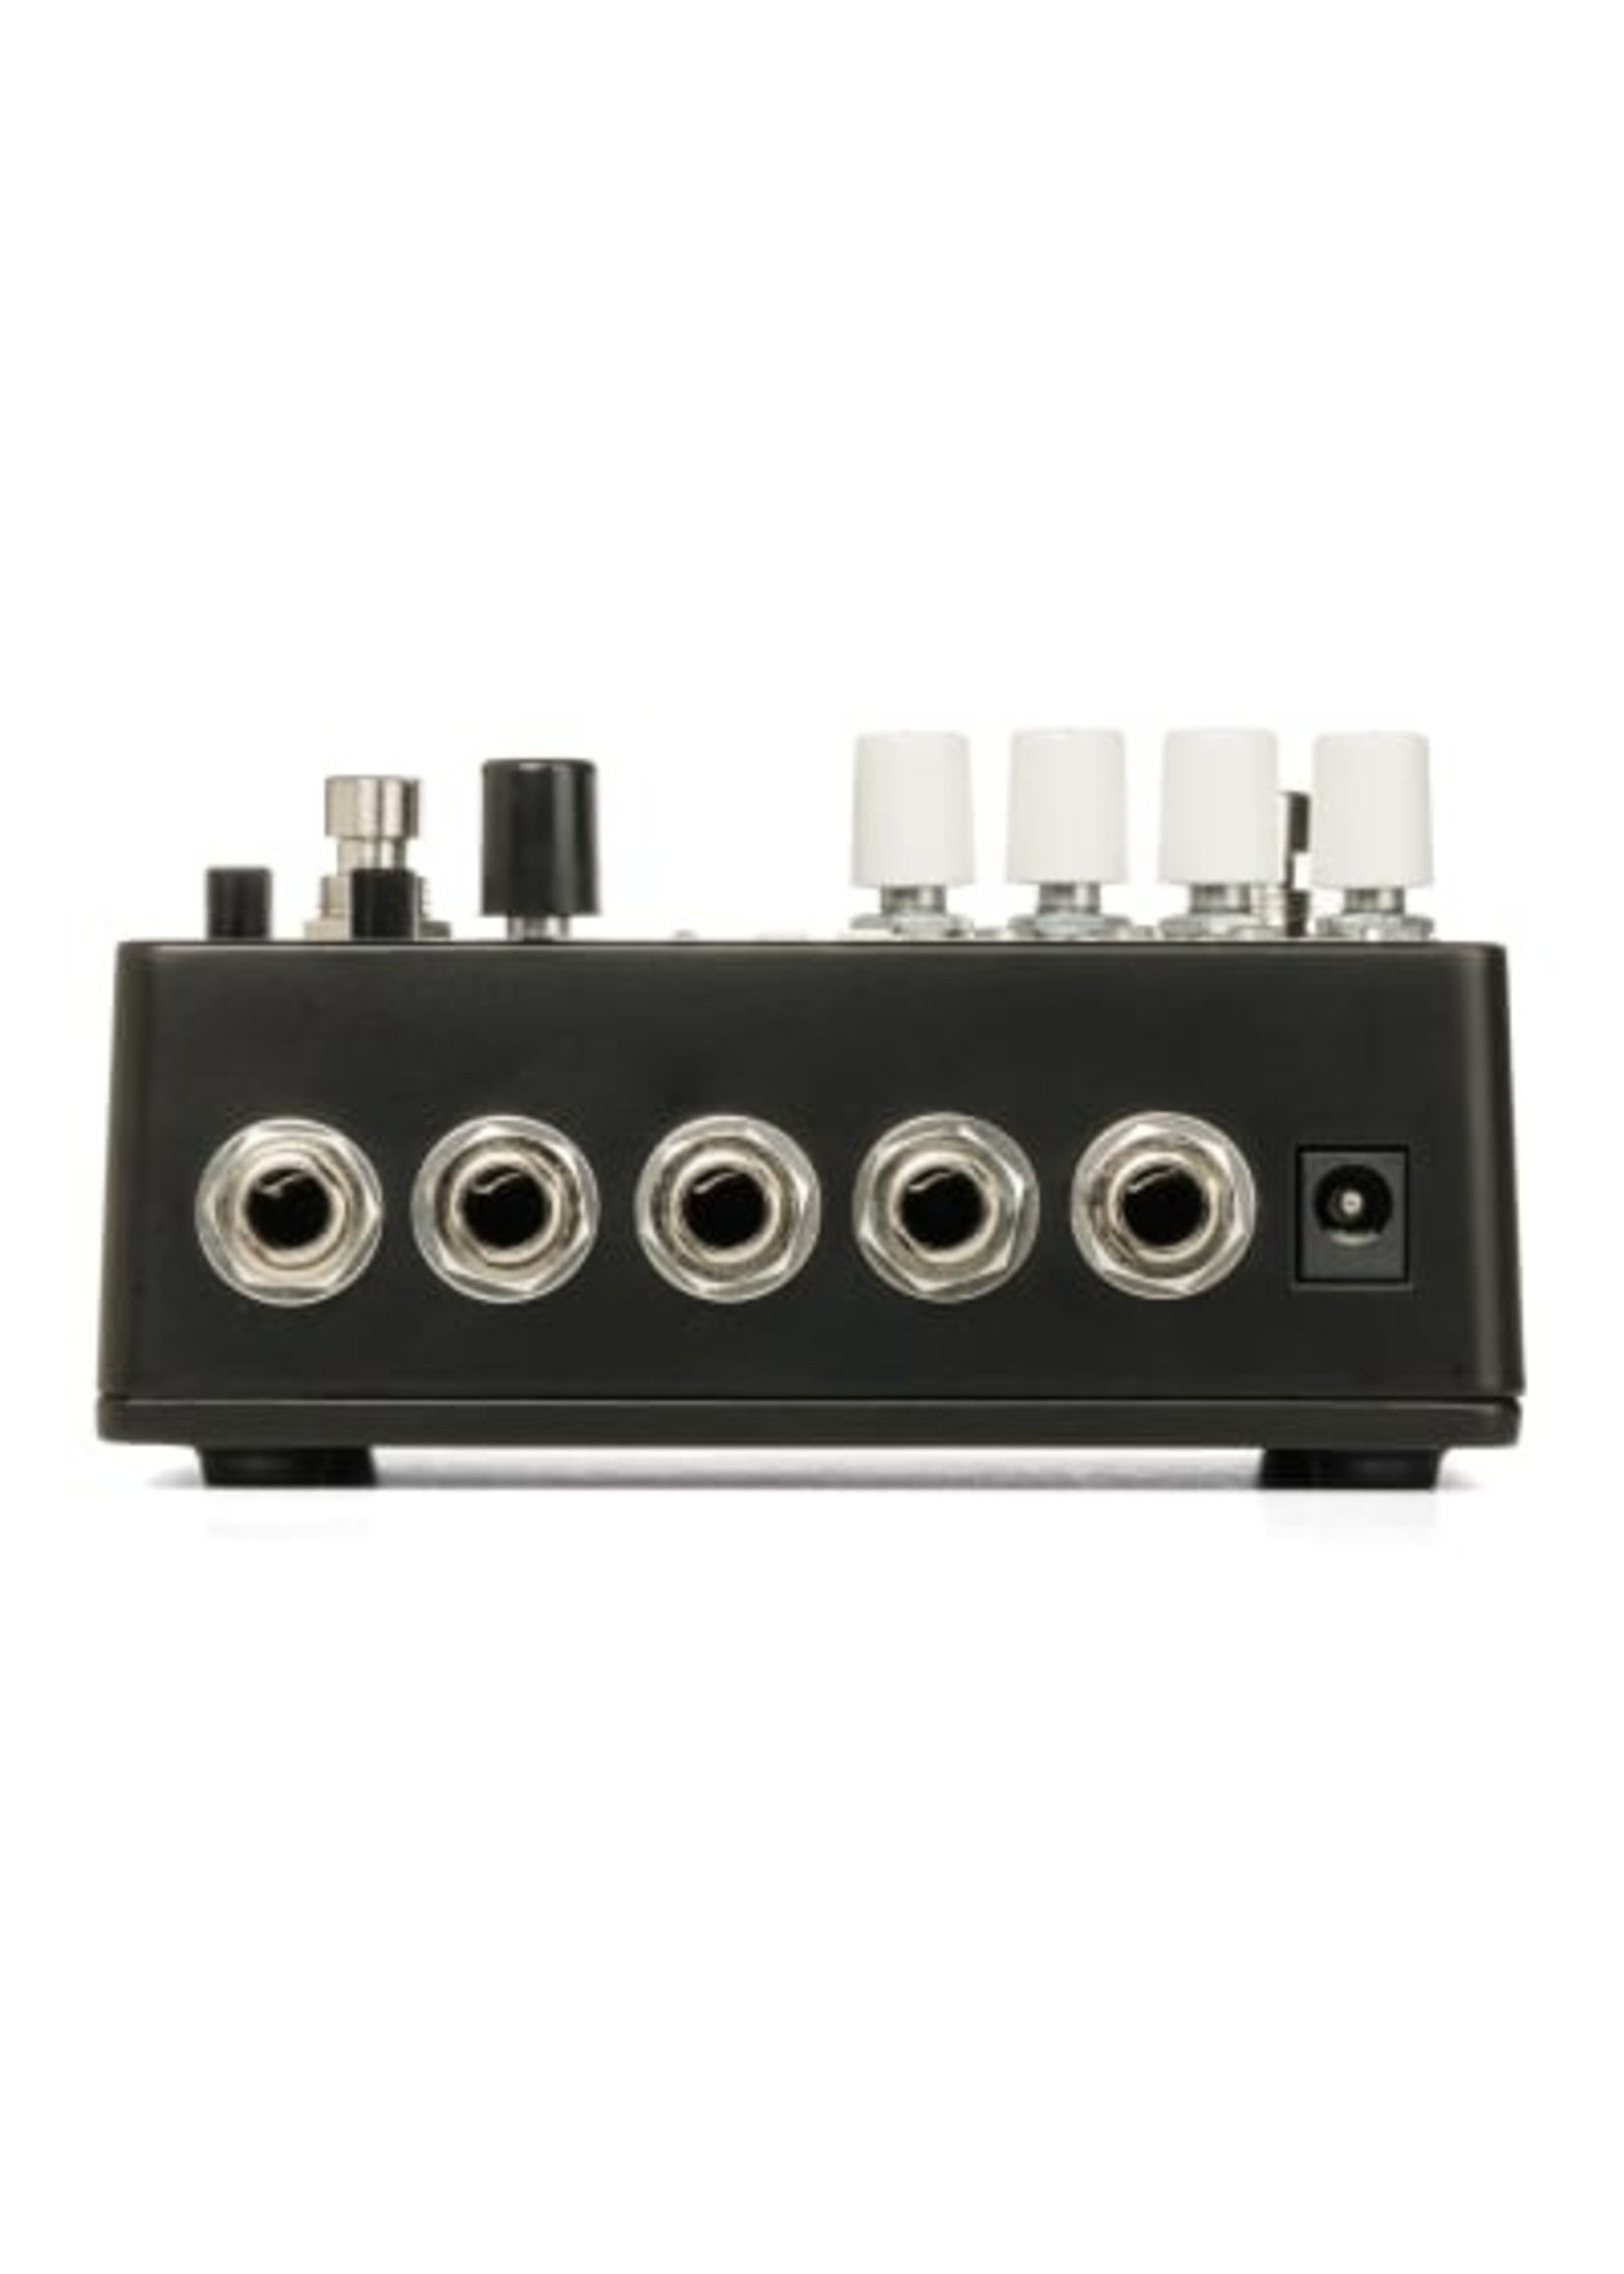 Electro-Harmonix Electro-Harmonix Oceans 12 Dual Stereo Reverb Pedal